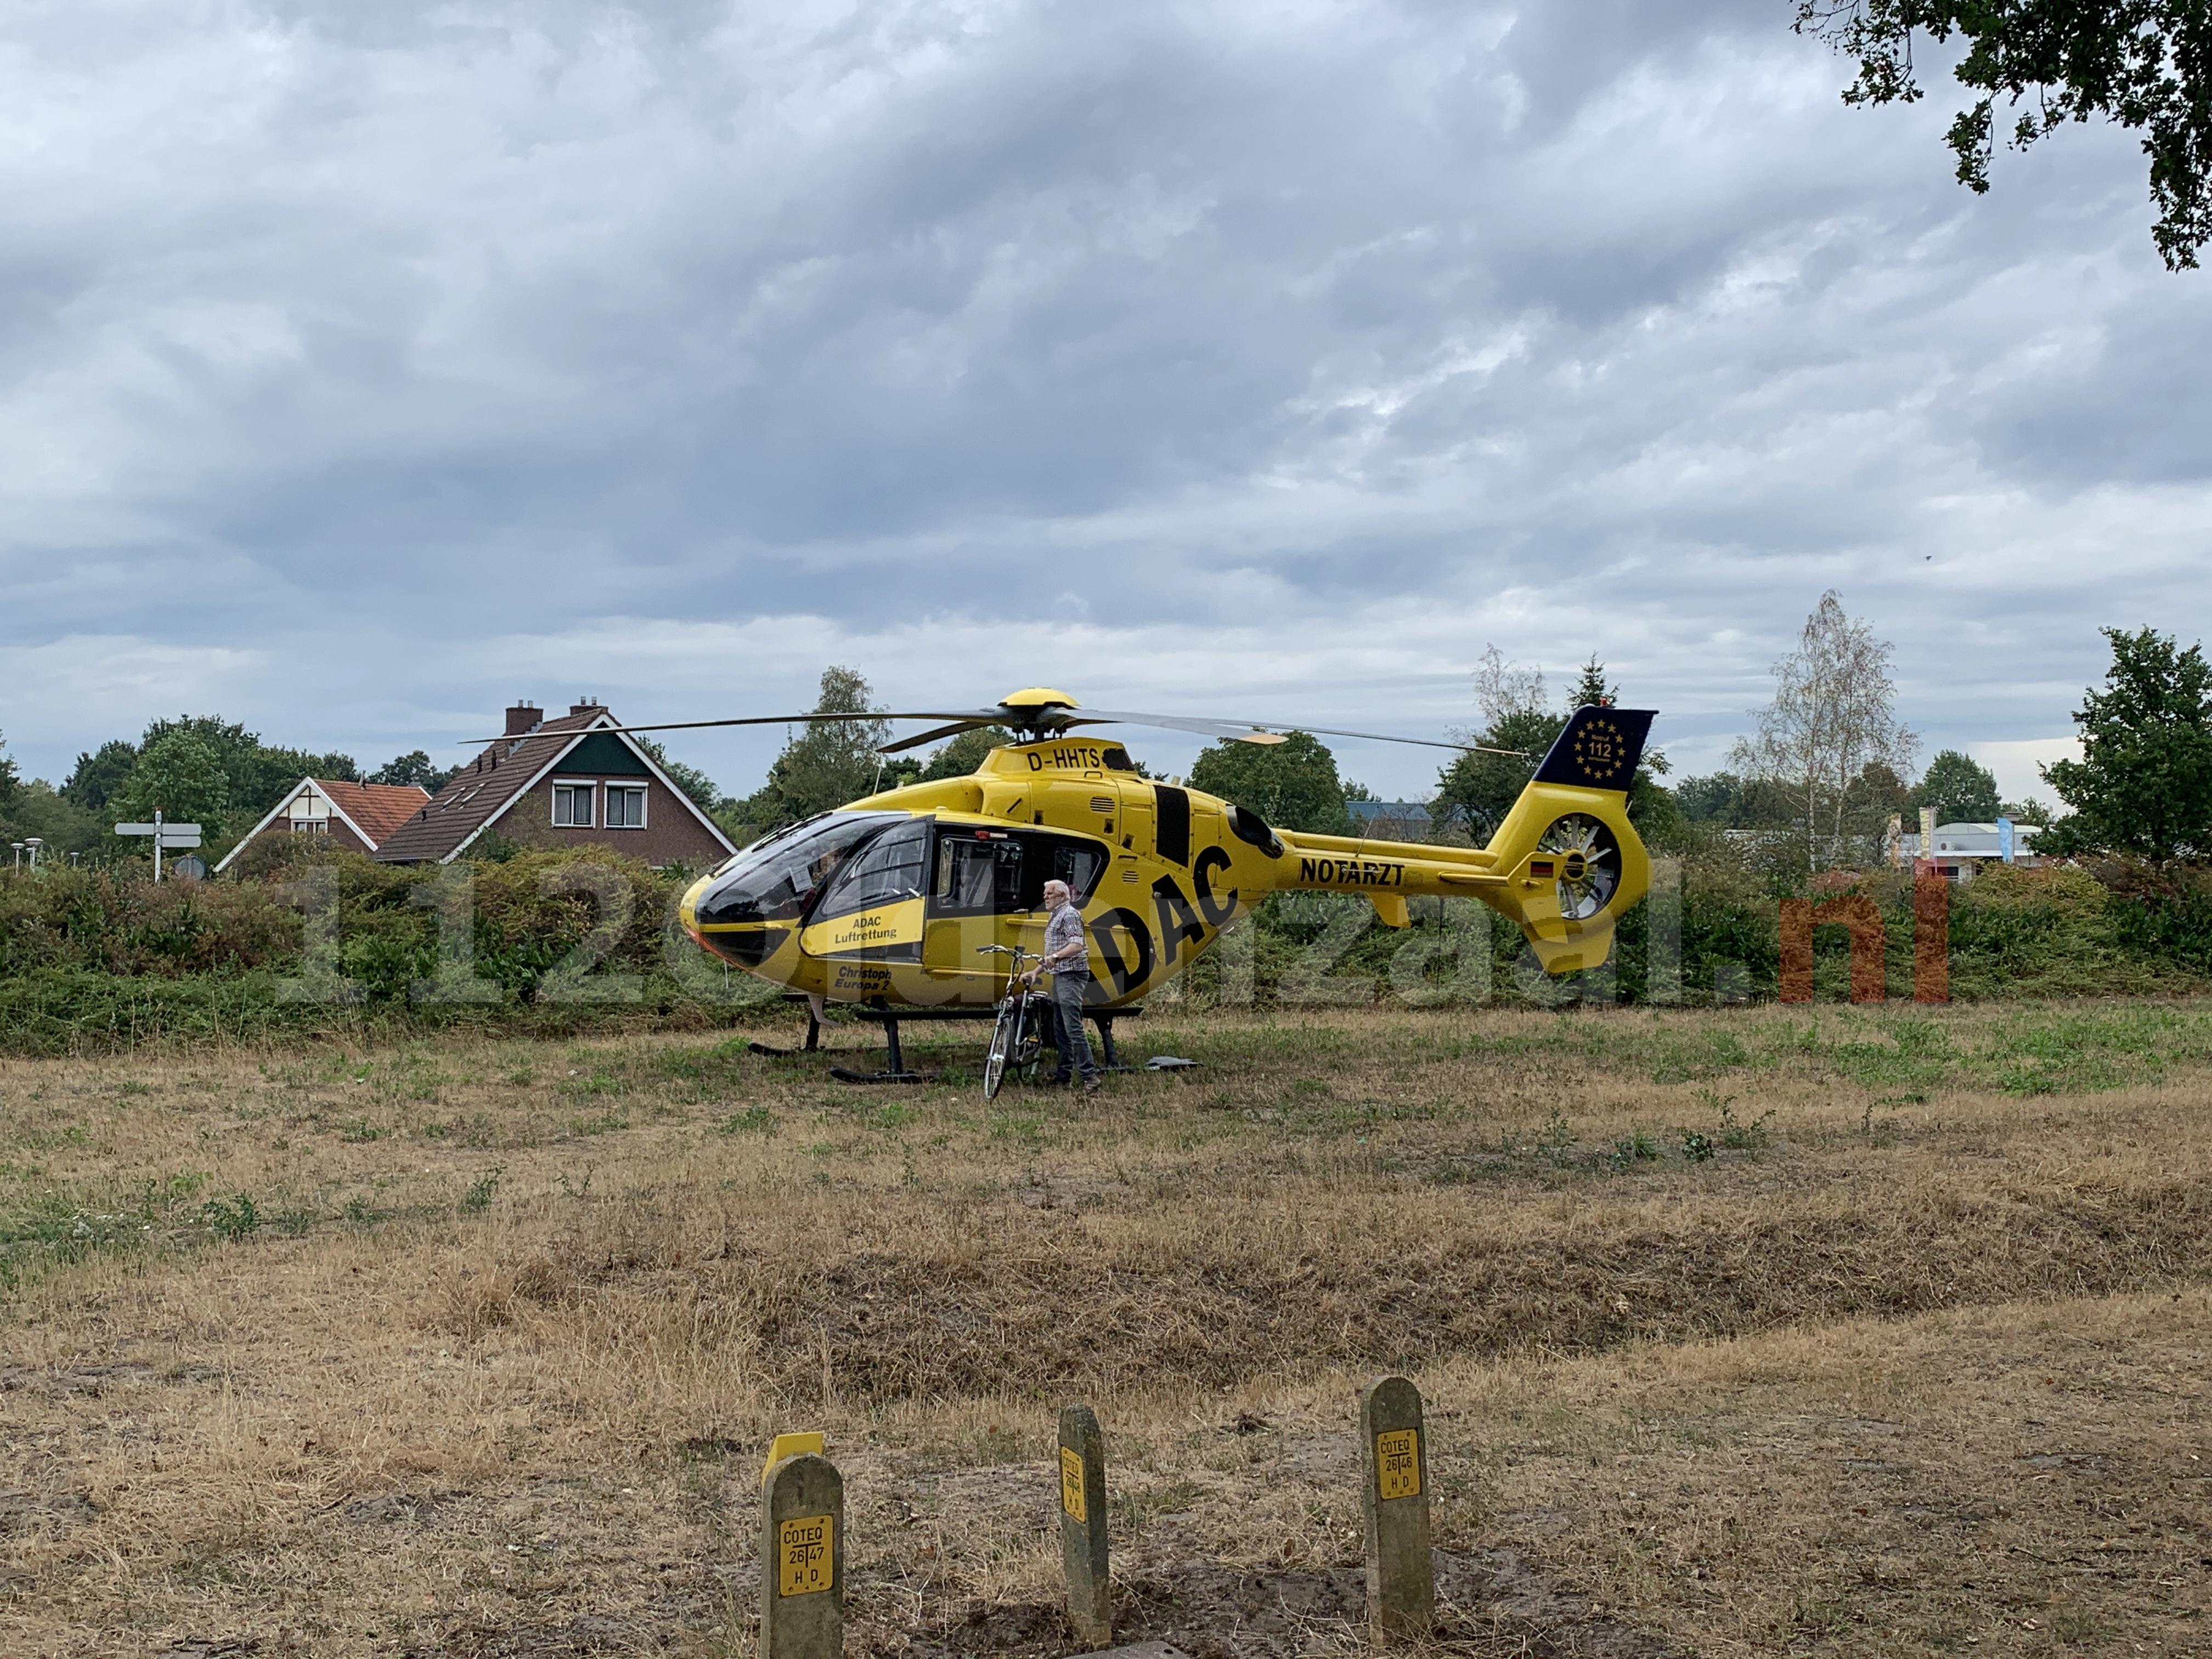 VIDEO: Traumahelikopter stijgt op na inzet in Oldenzaal